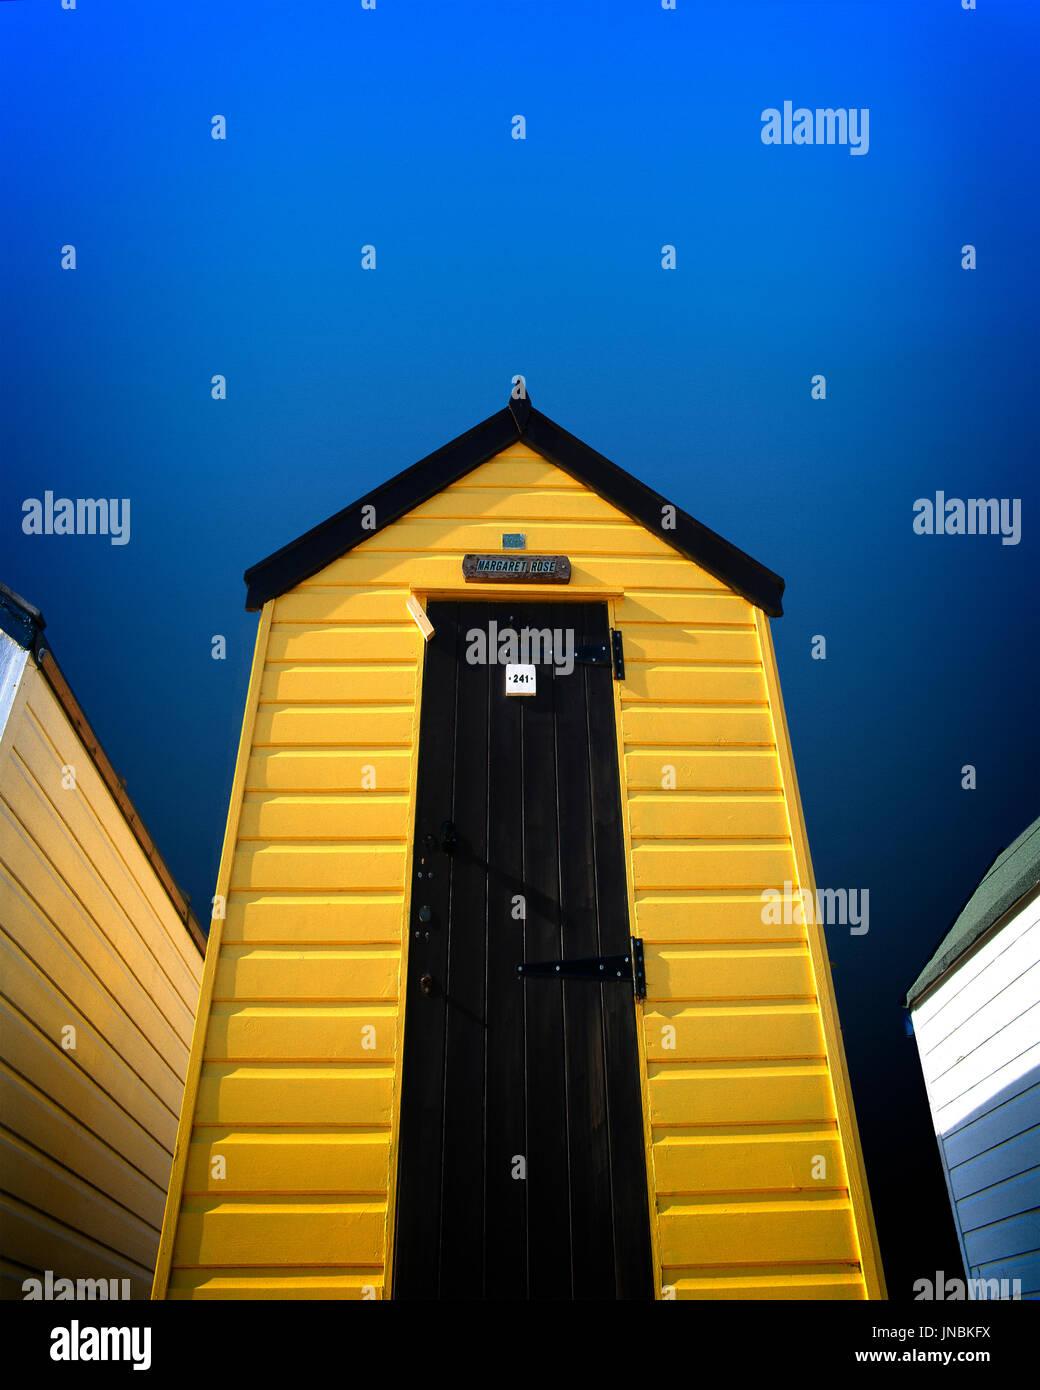 DIGITAL ART: Traditional English Beach Hut - Stock Image